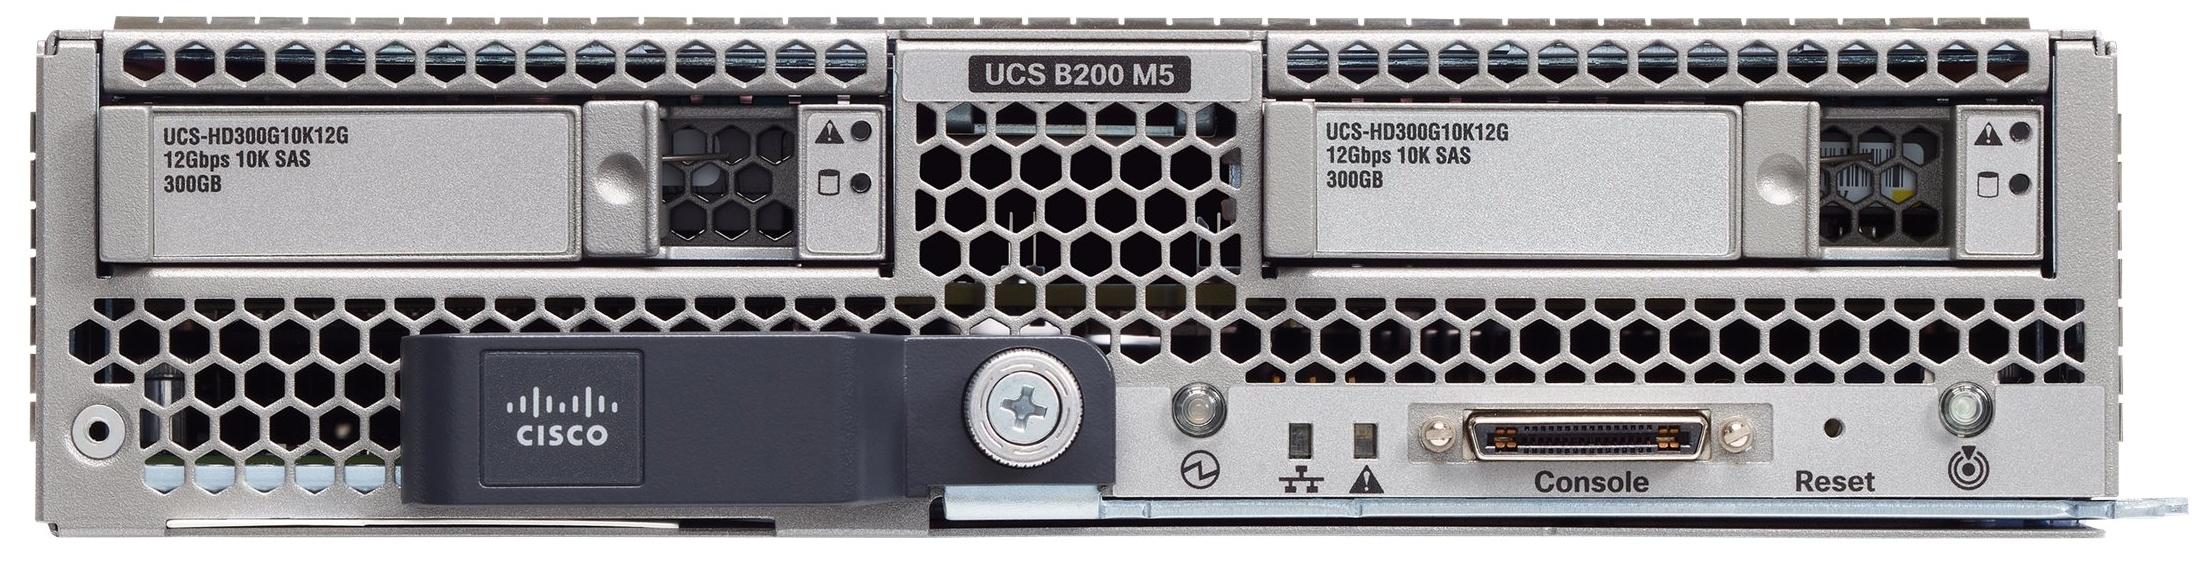 Cisco UCS B200 M5 Front